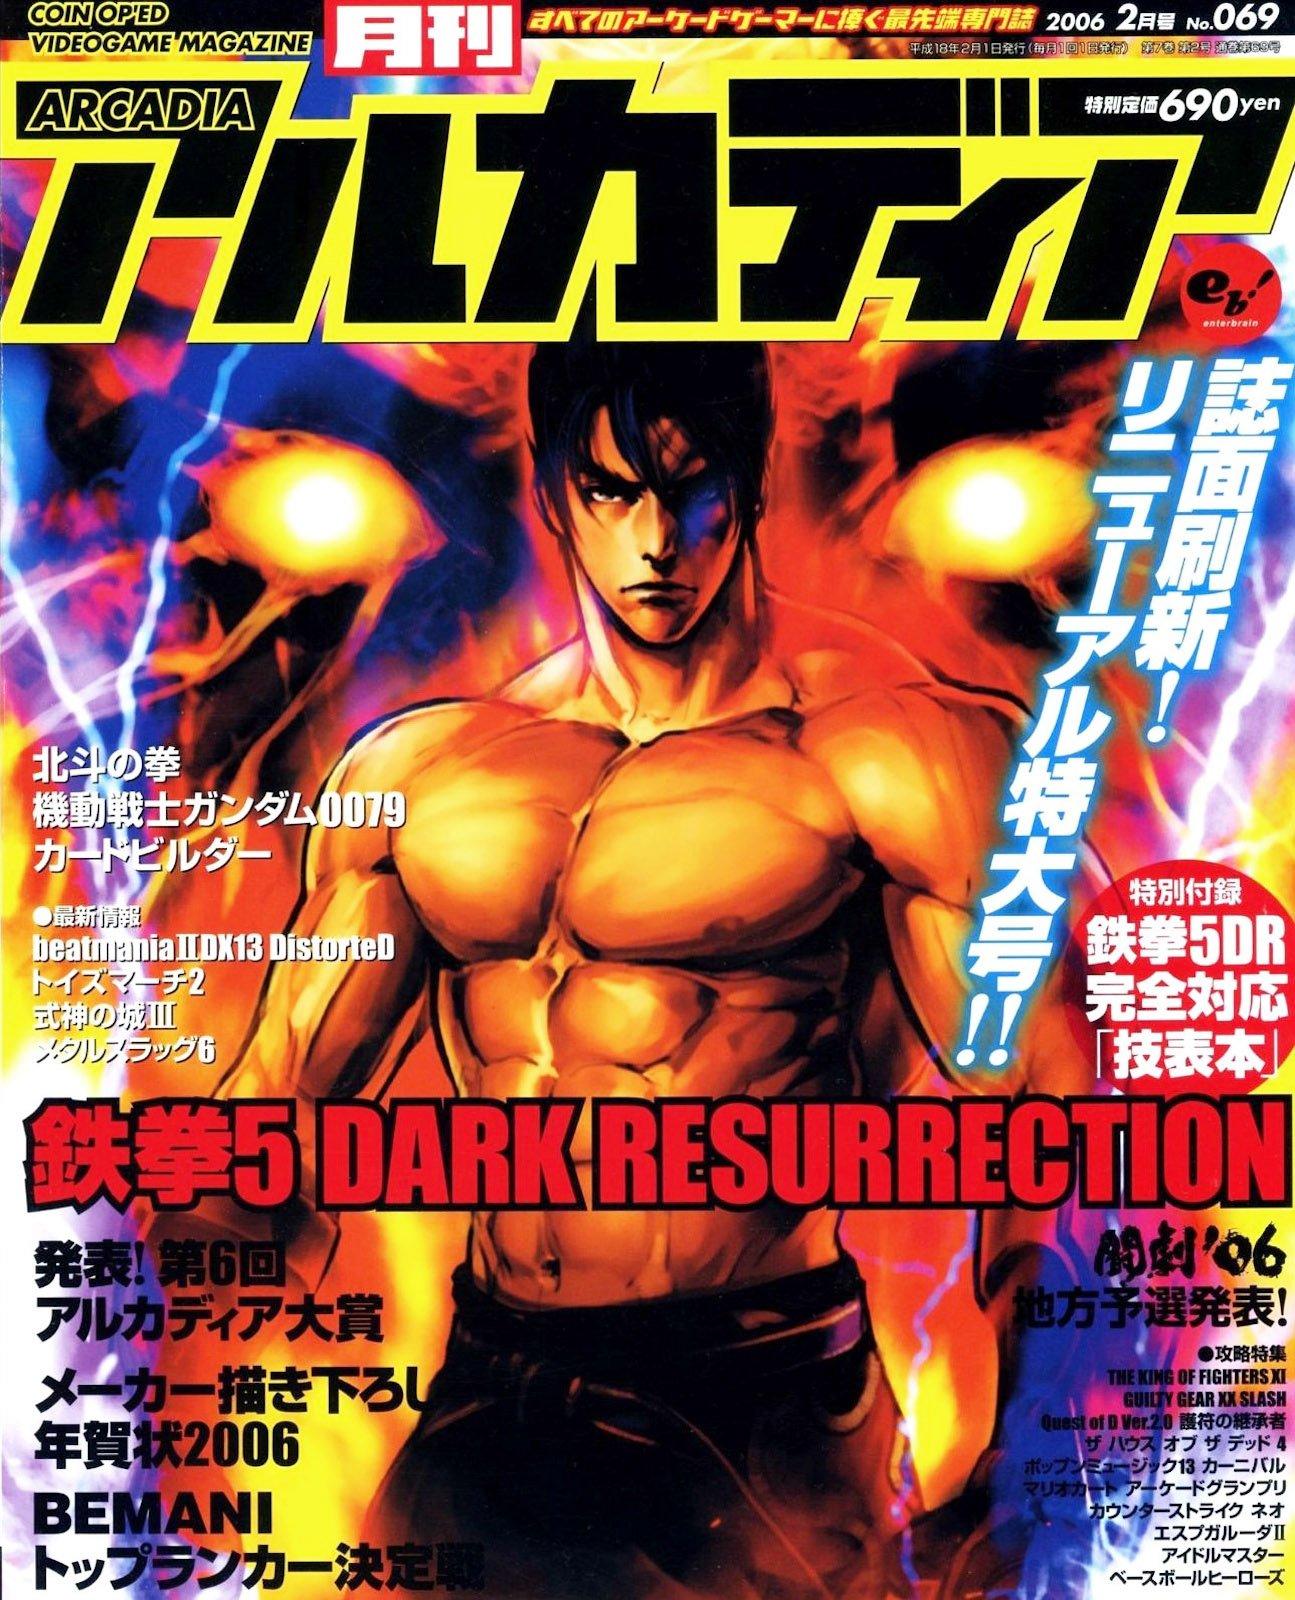 Arcadia Issue 069 (February 2006)